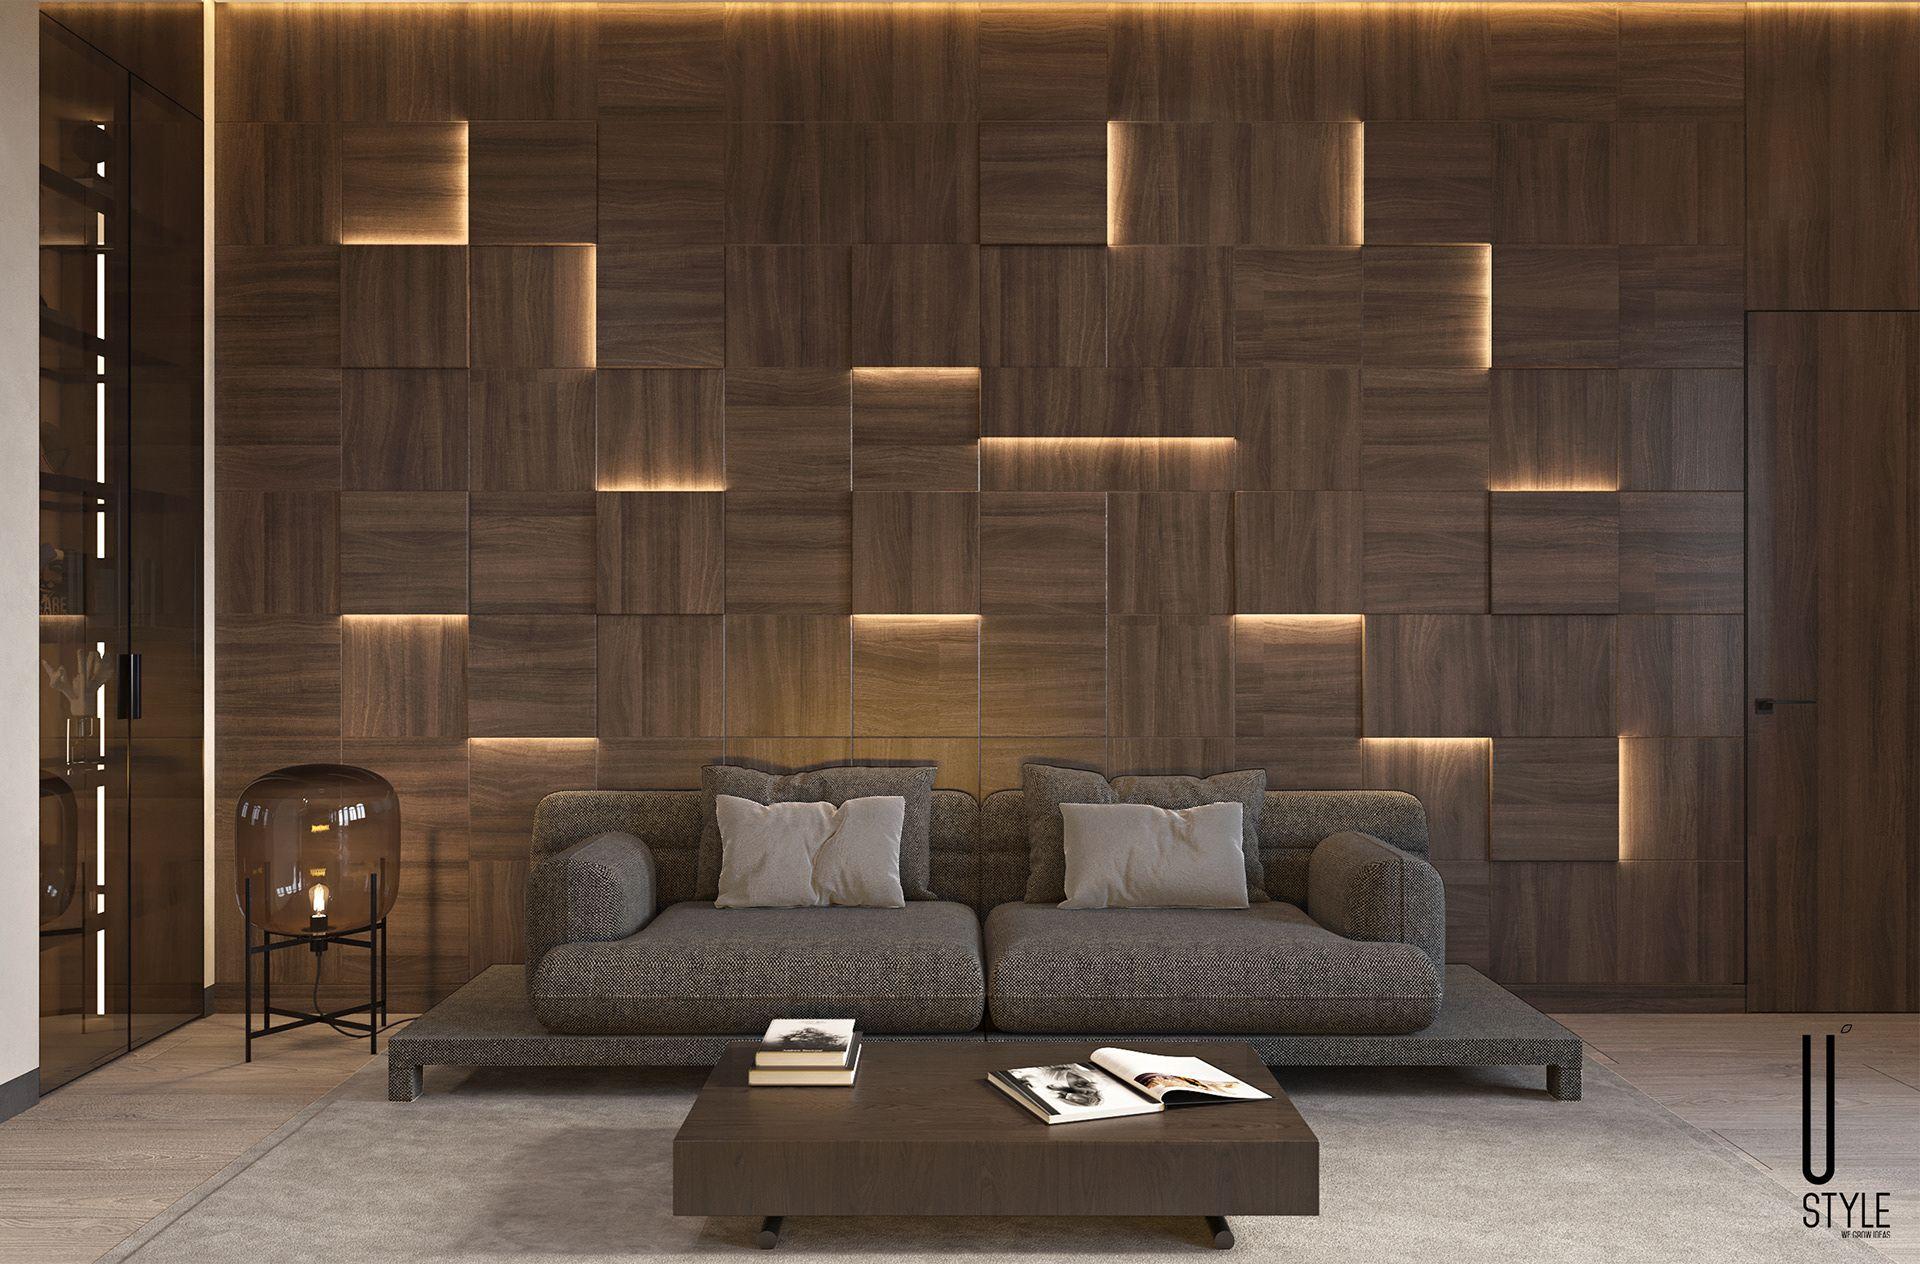 Ui049 On Behance Luxury Living Room Design Wall Cladding Designs Luxury Living Room